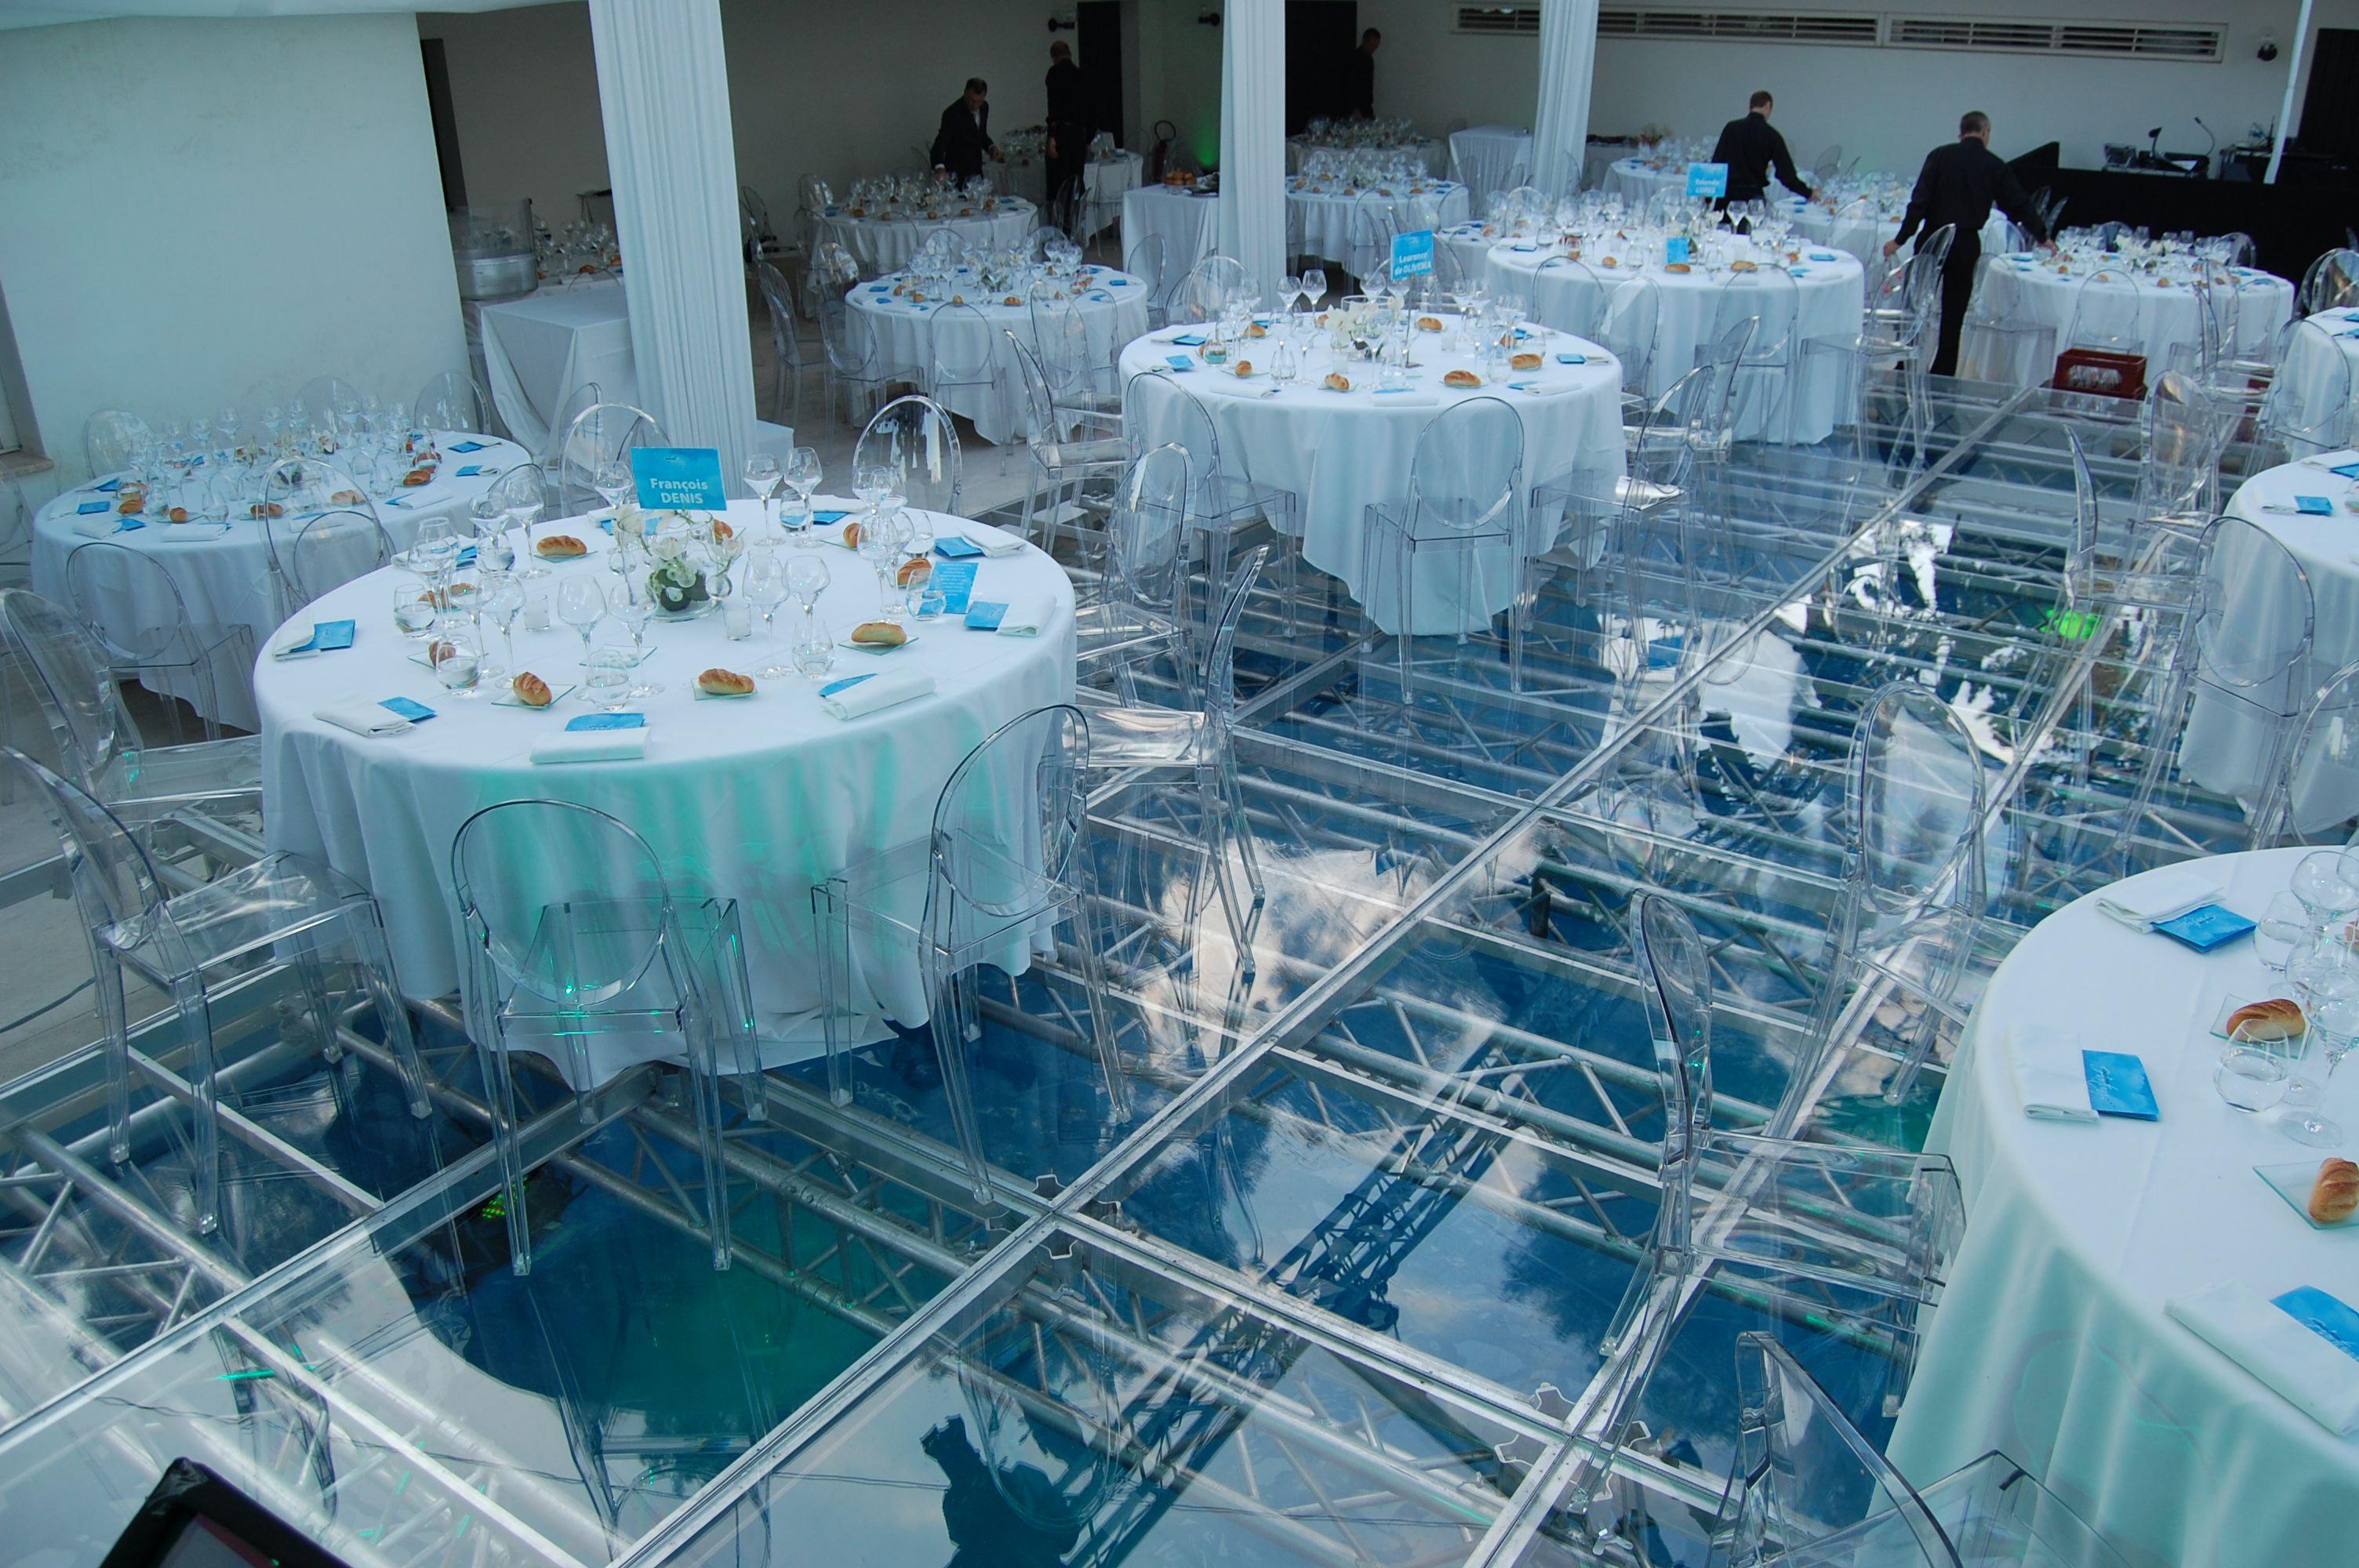 acrylic wedding pool cover rental in miami